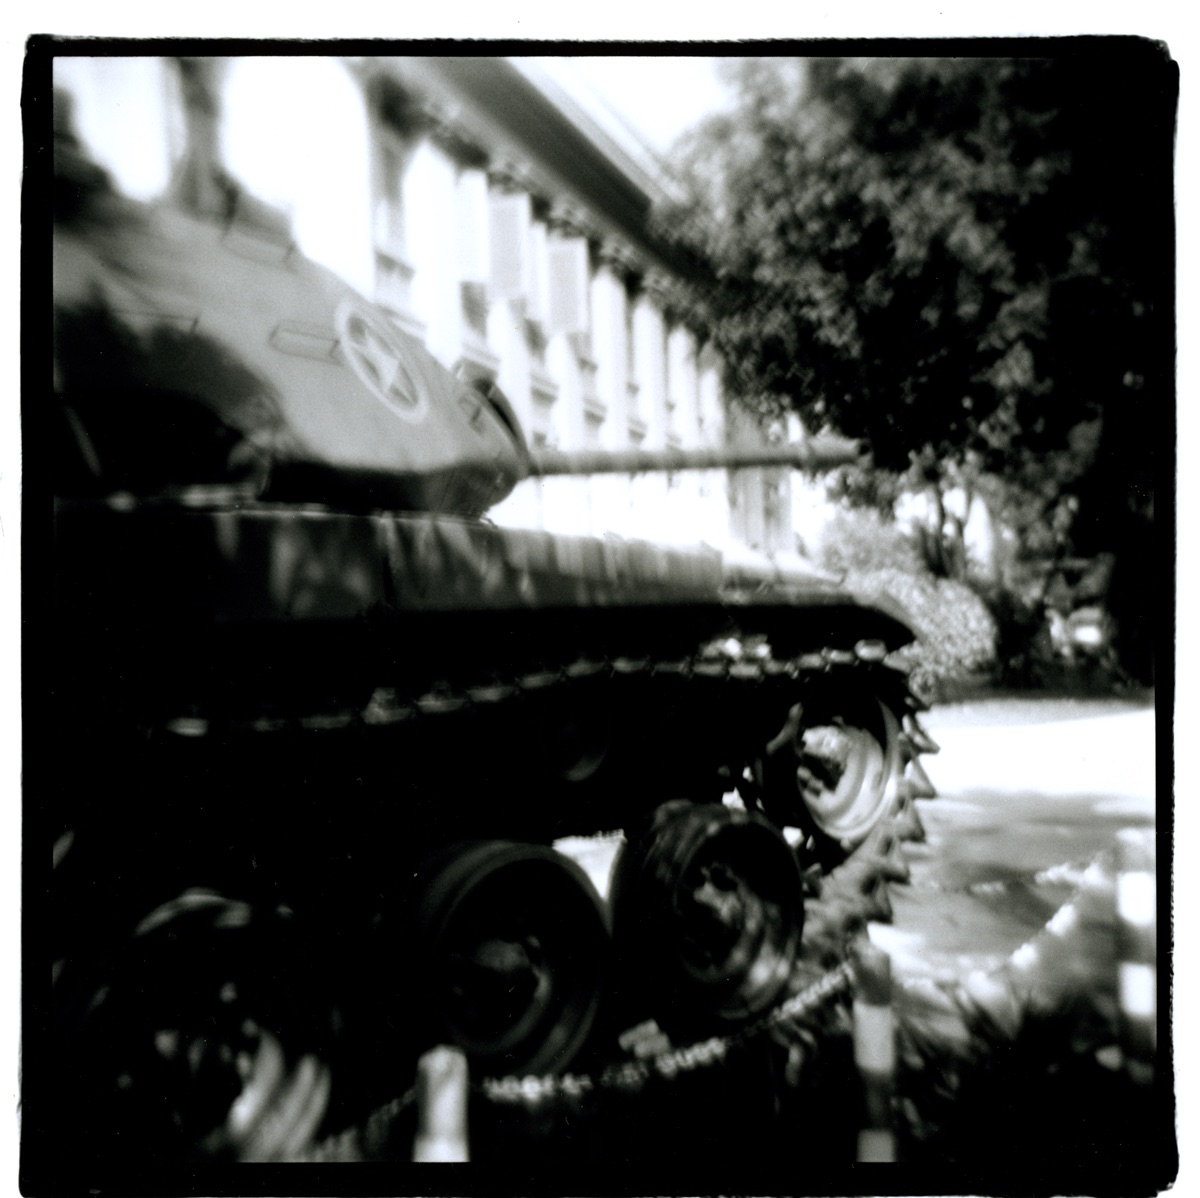 North Vietnamese Tank (2014)